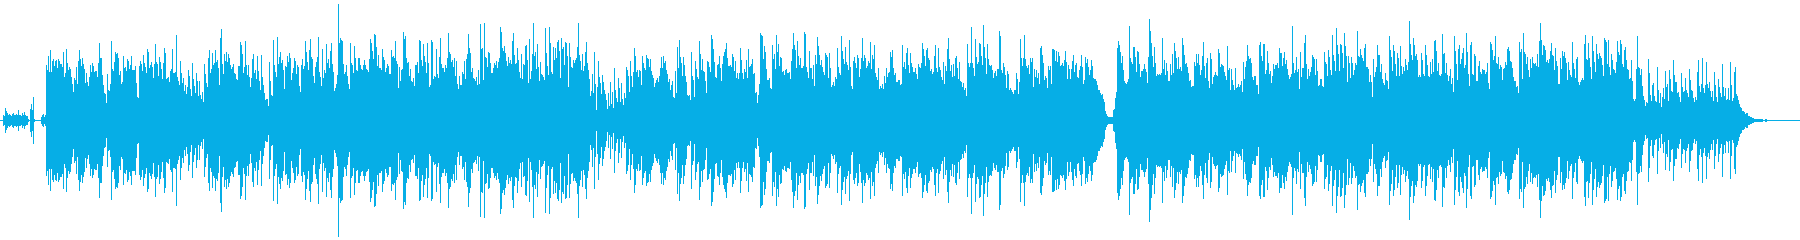 So Farの再生済みの波形